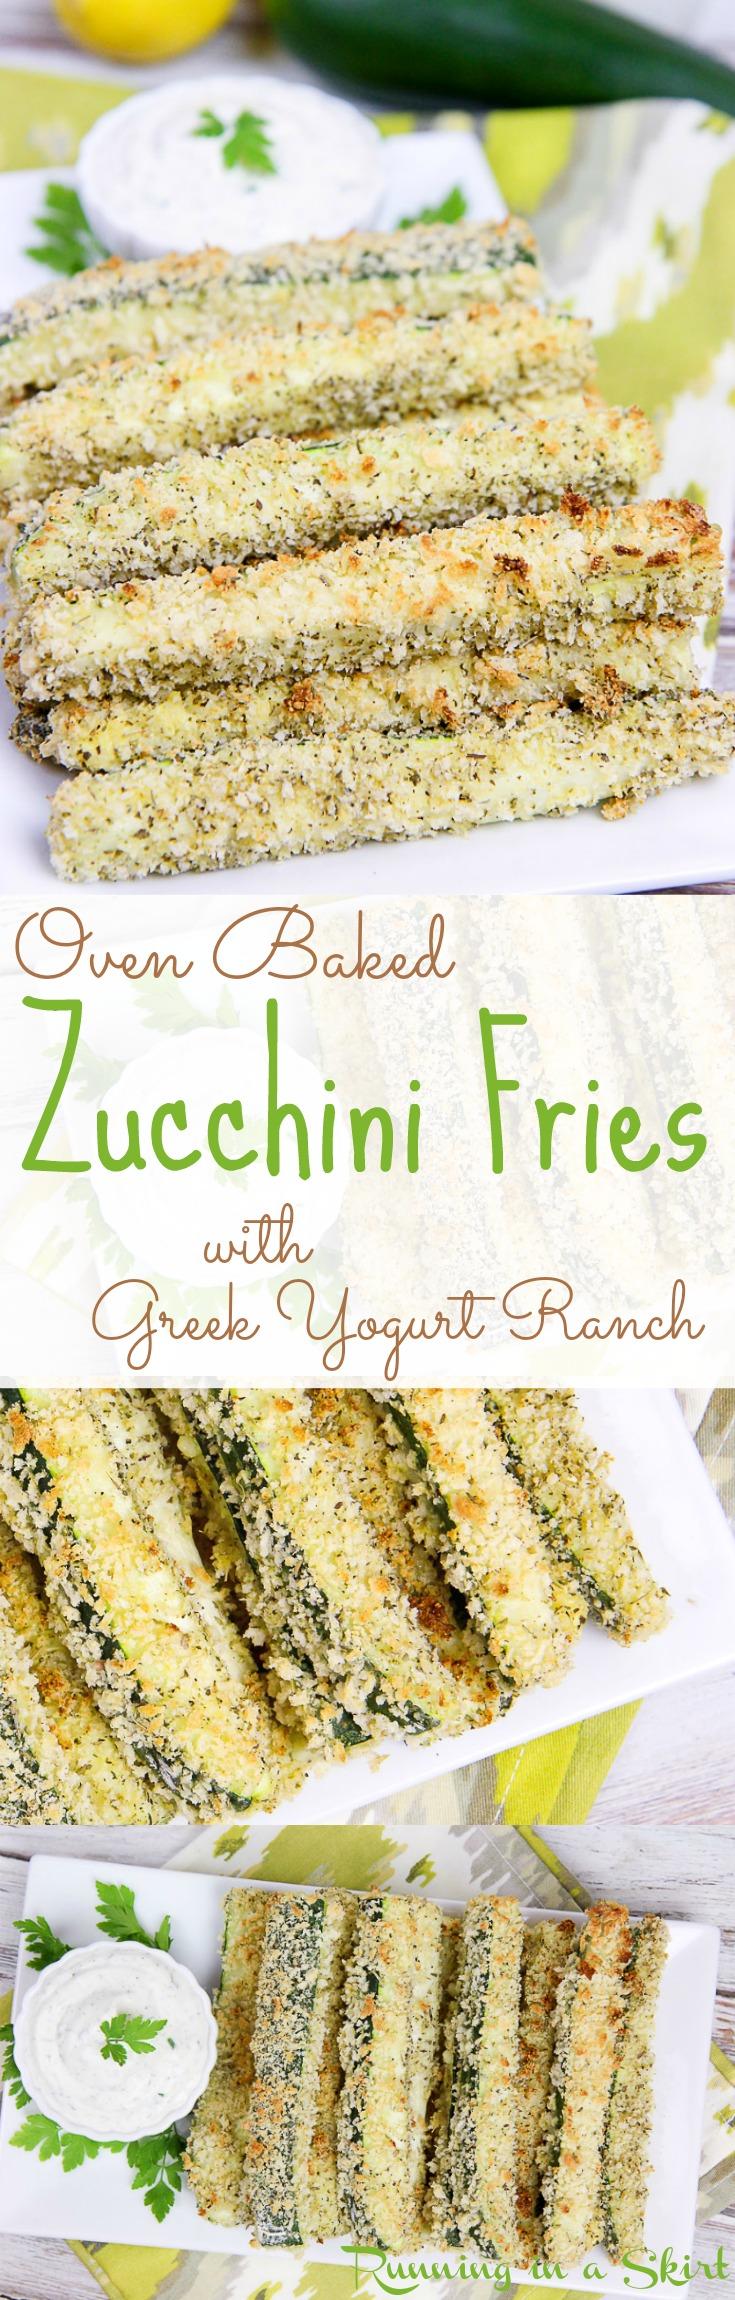 ed Zucchini Fries with greek yogurt ranch